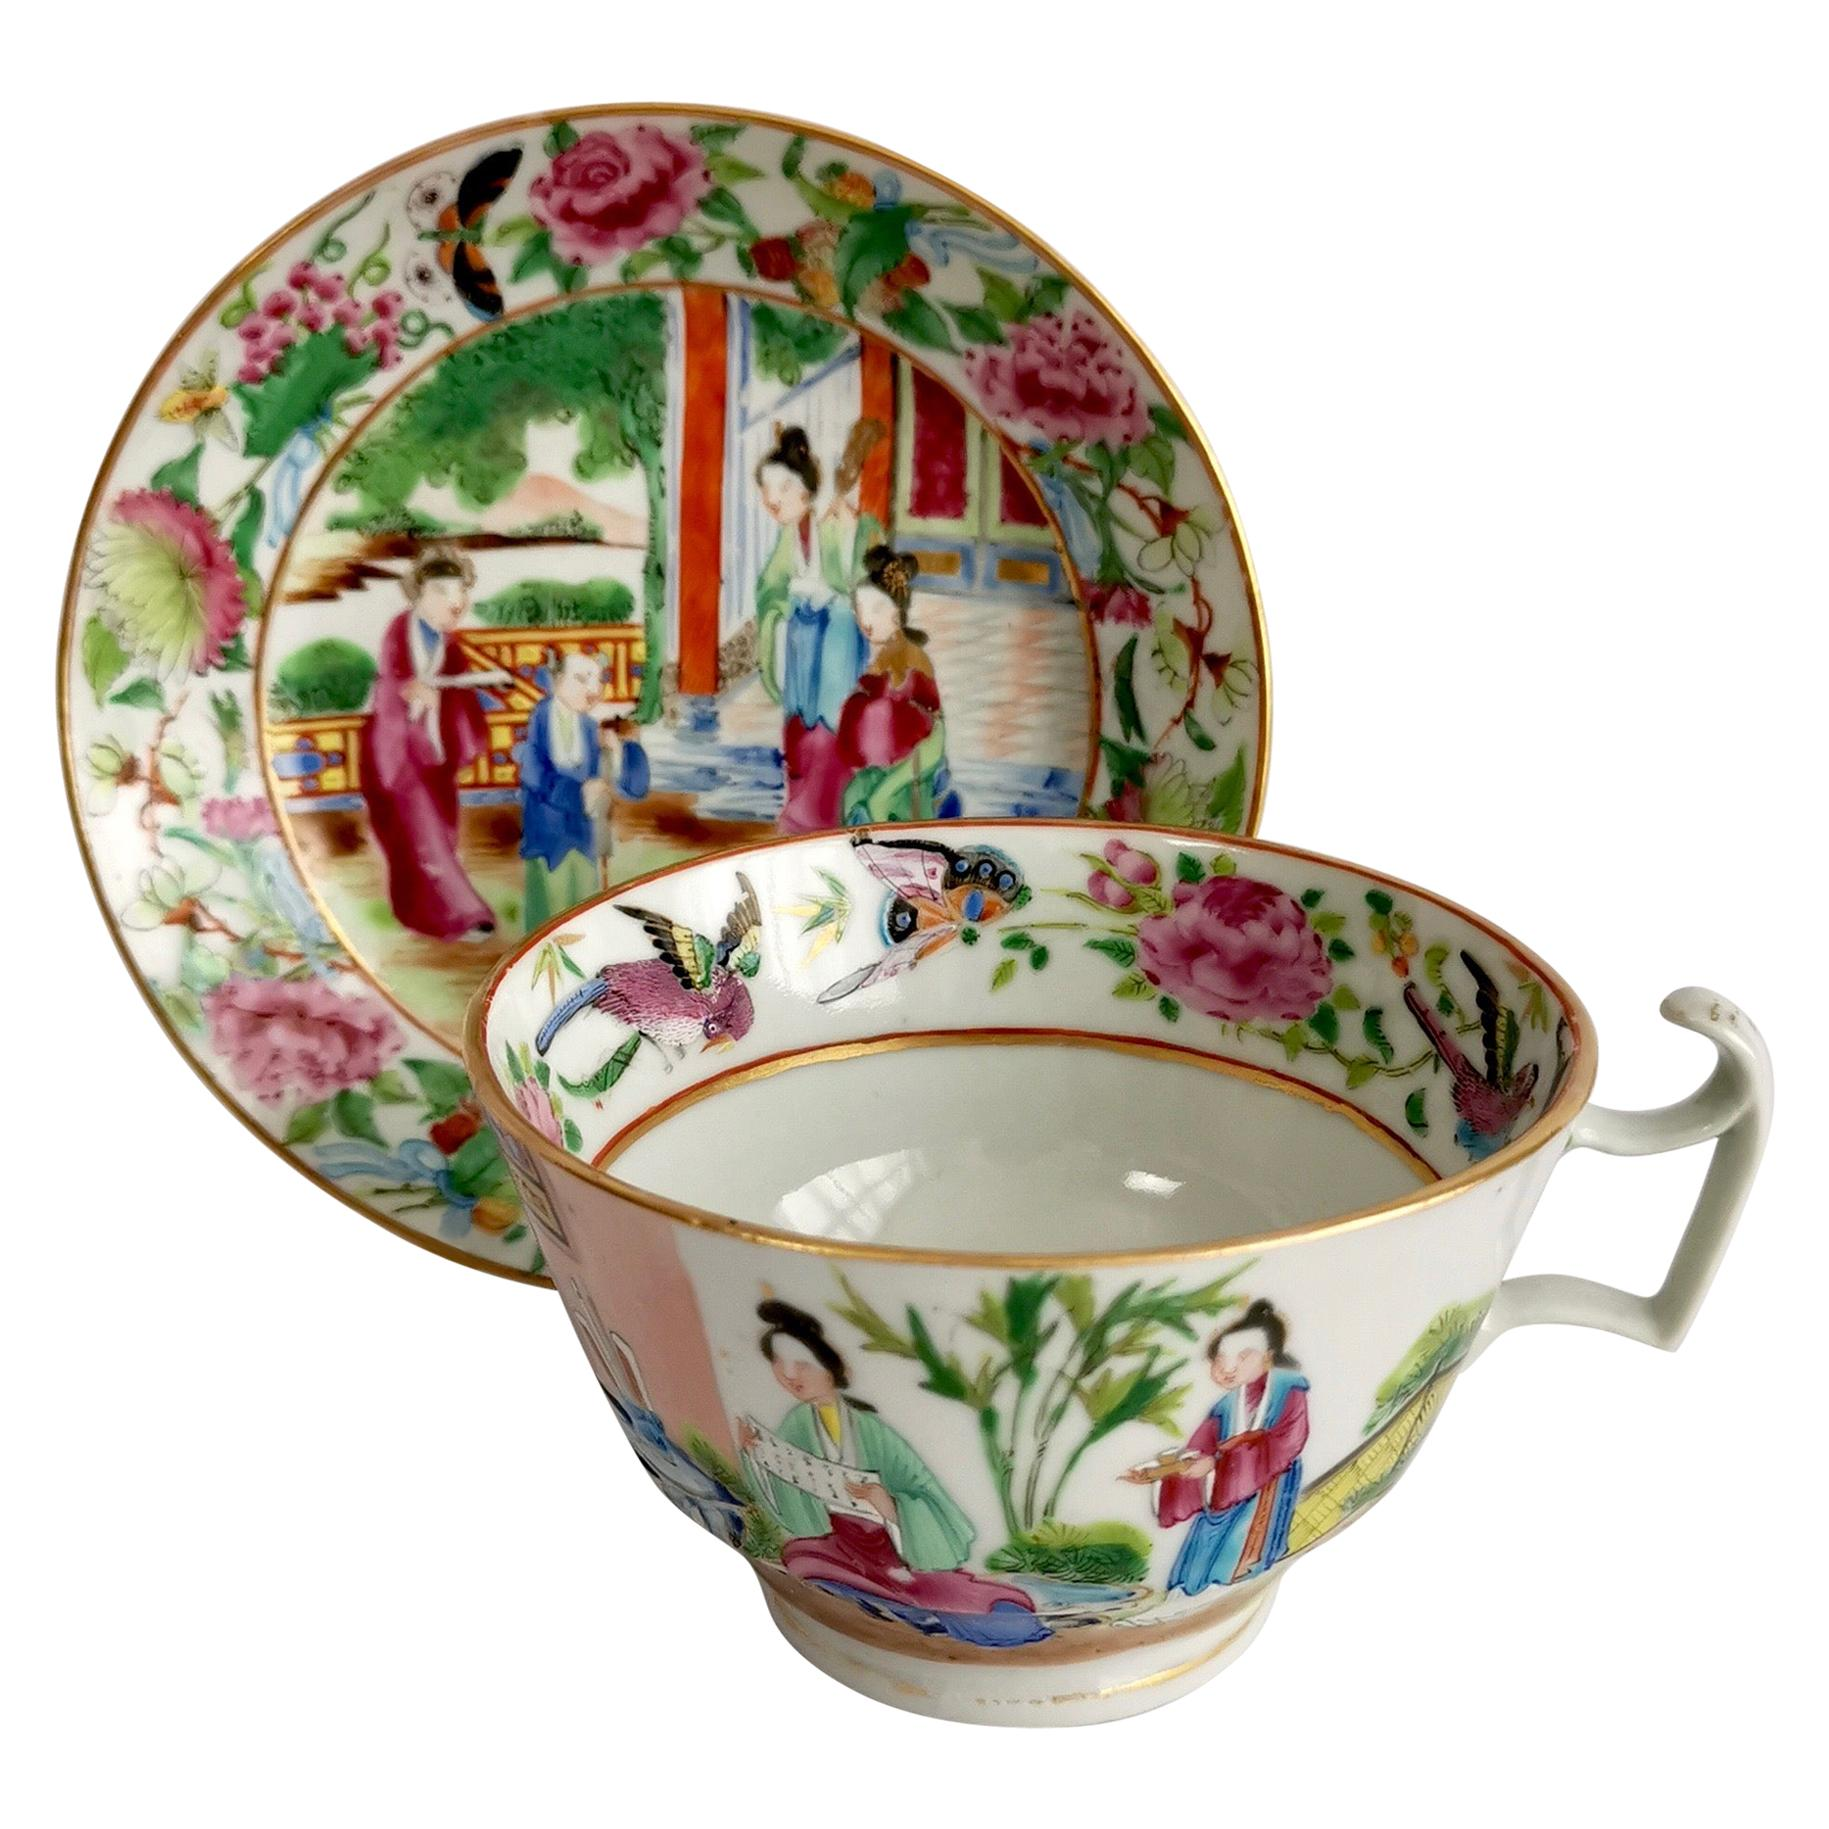 Chinese Export Porcelain Breakfast Teacup, Canton Famille Verte Figures, '1'